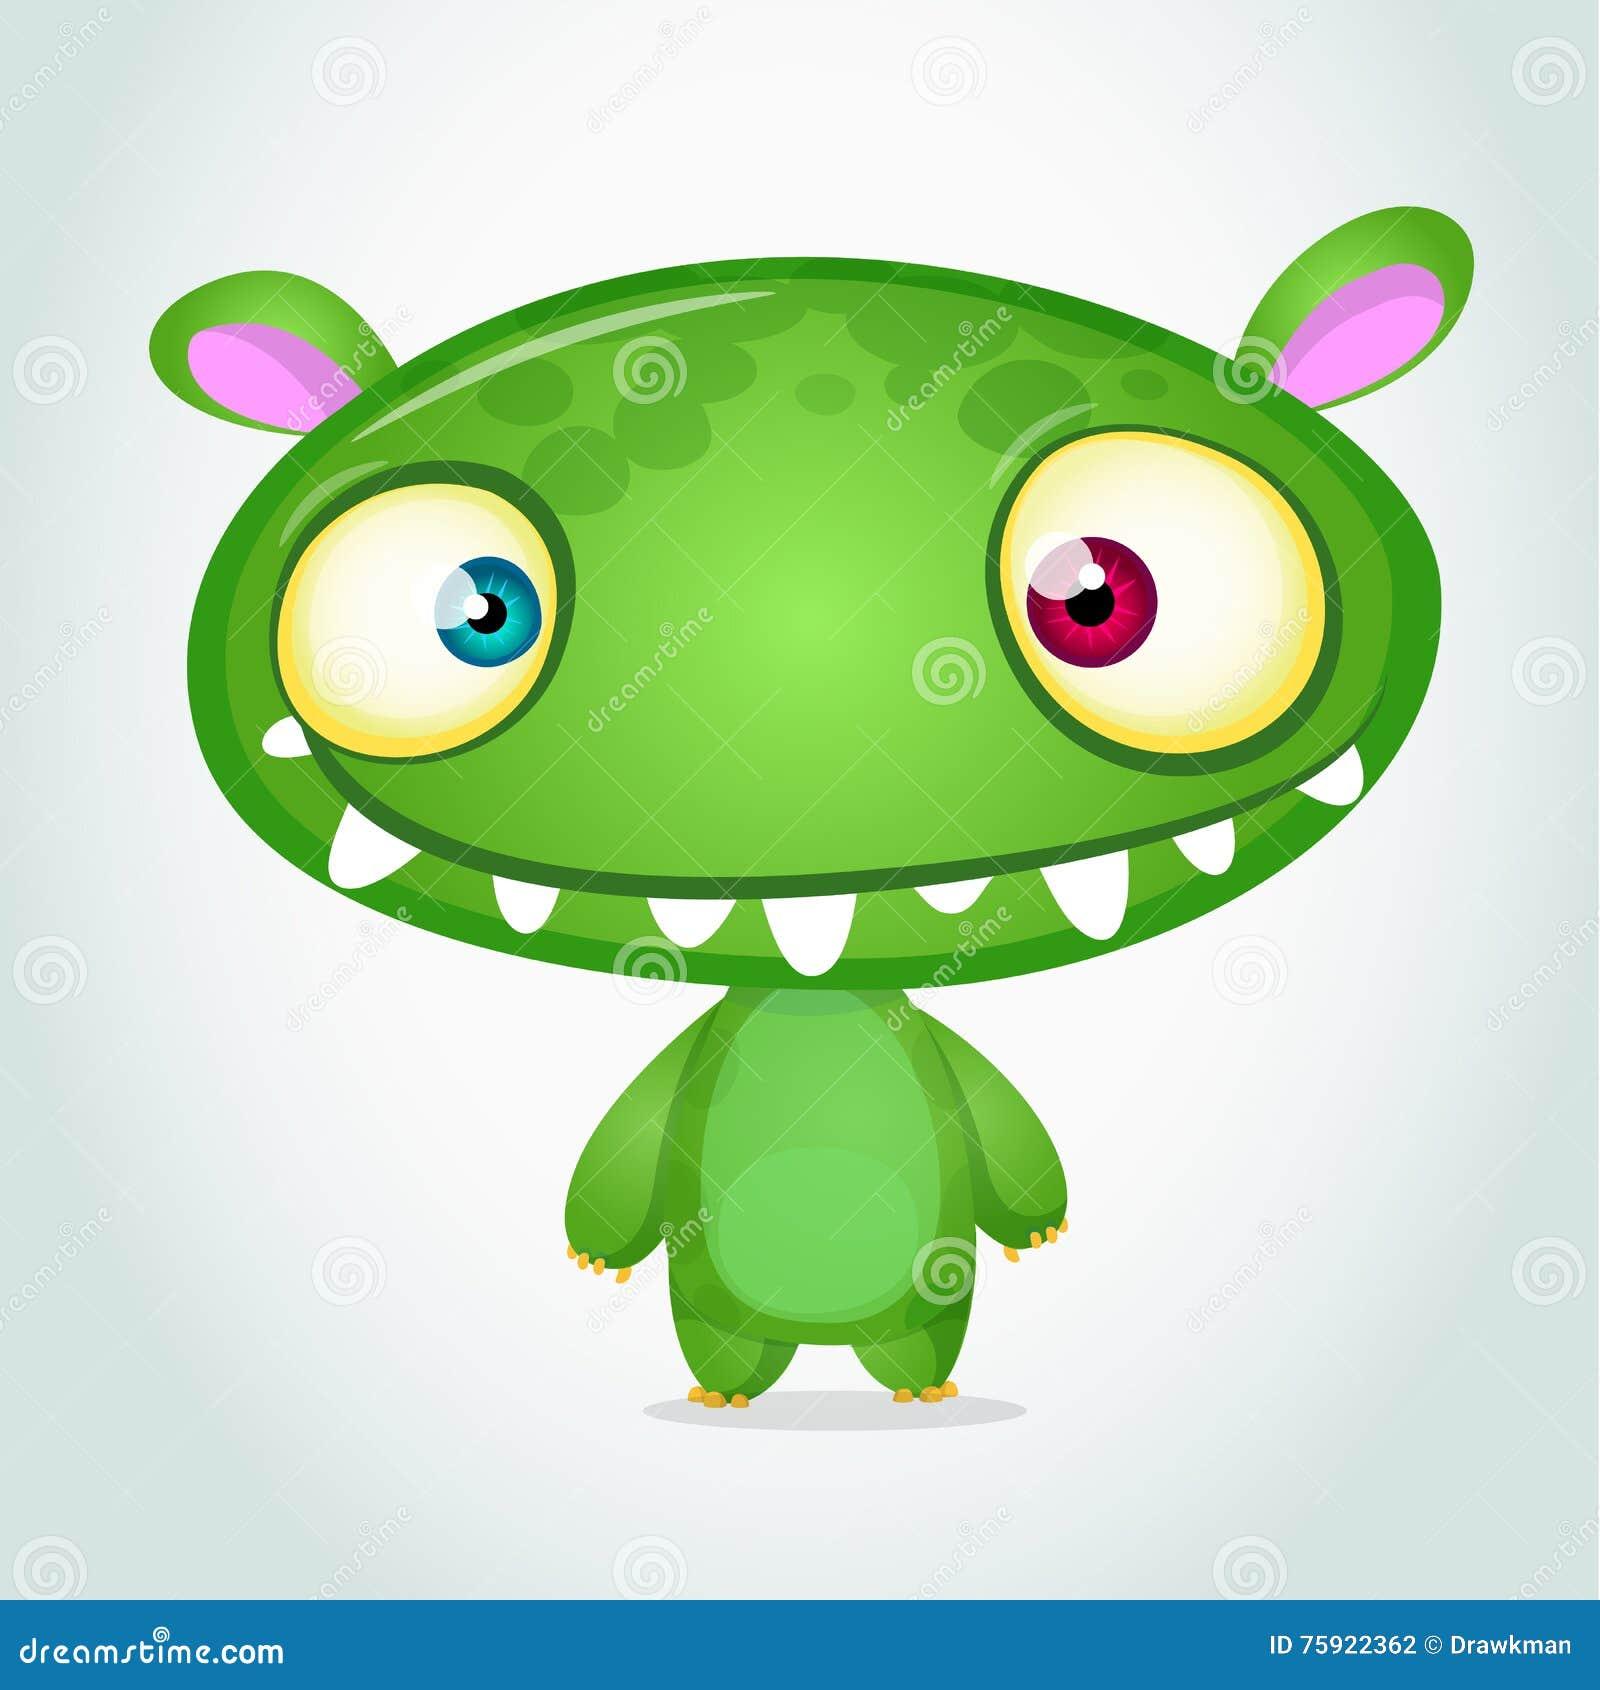 Vector cute cartoon monster alien. Halloween monster character